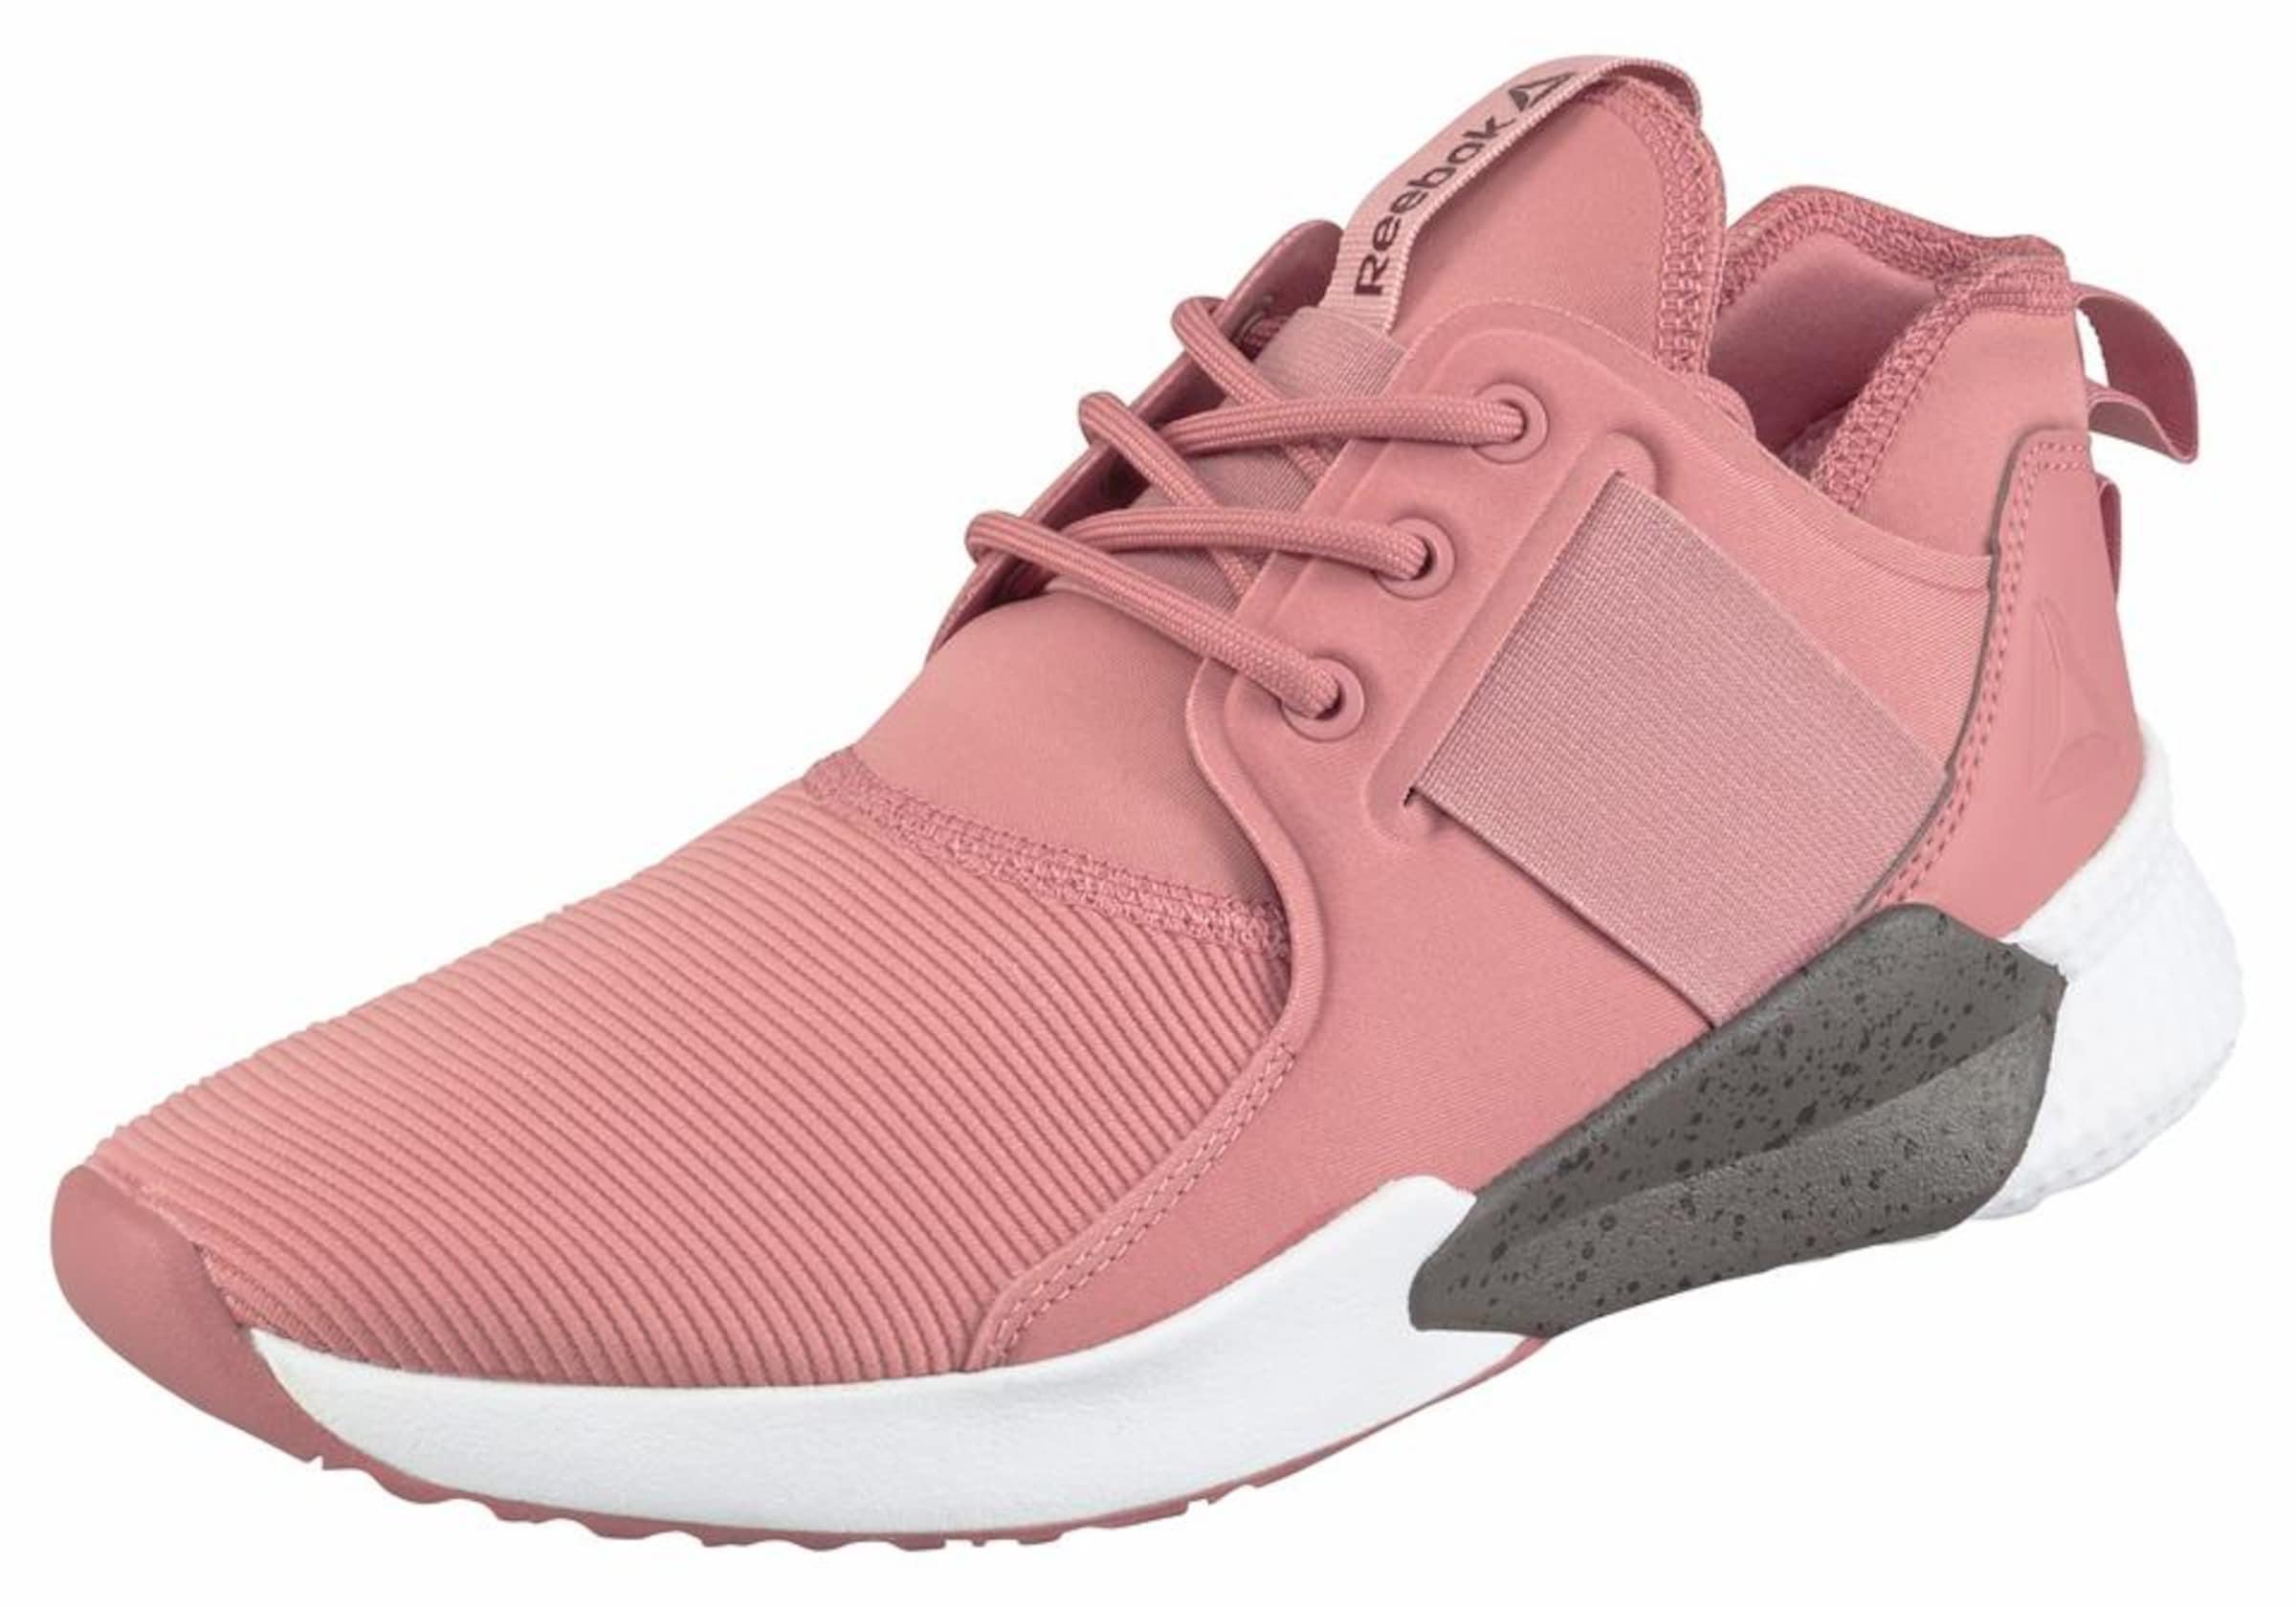 REEBOK Fitnessschuhe Gureso 1.0 Verschleißfeste billige Schuhe